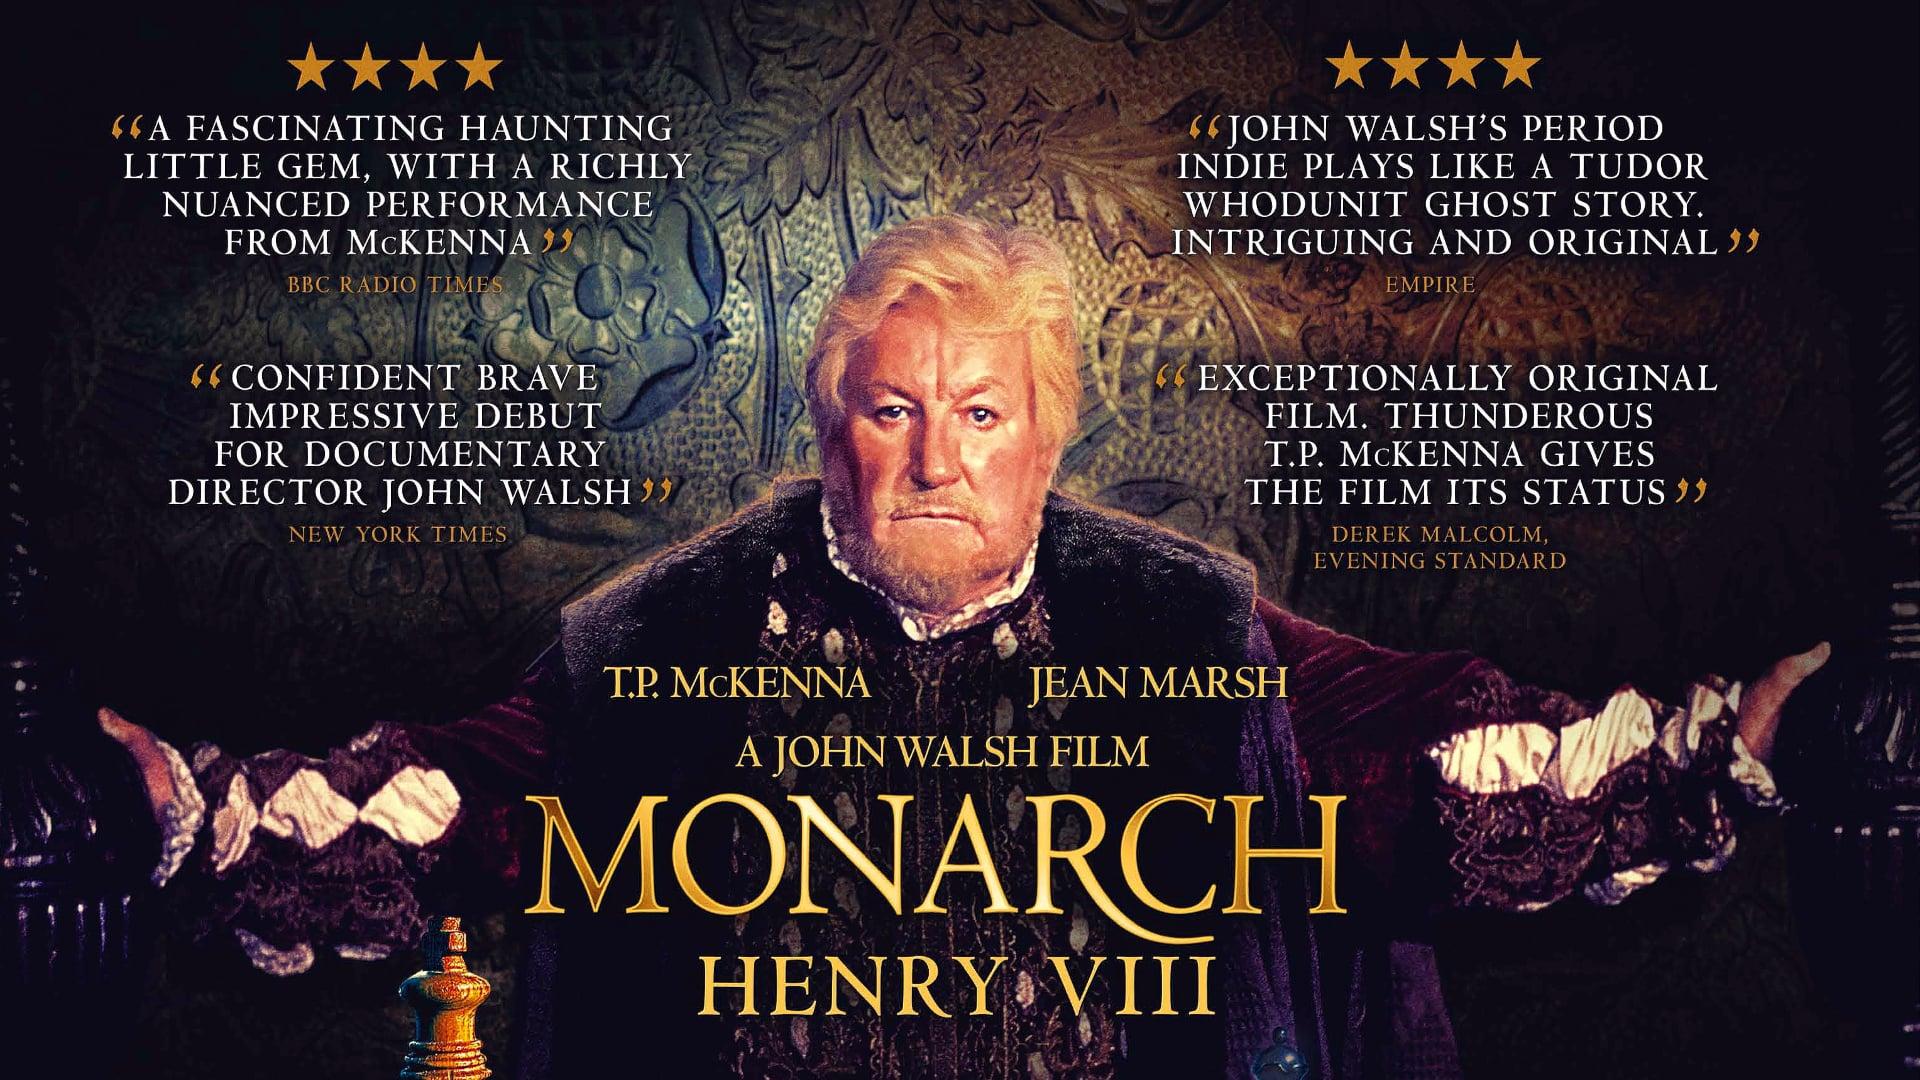 MONARCH feature film trailer